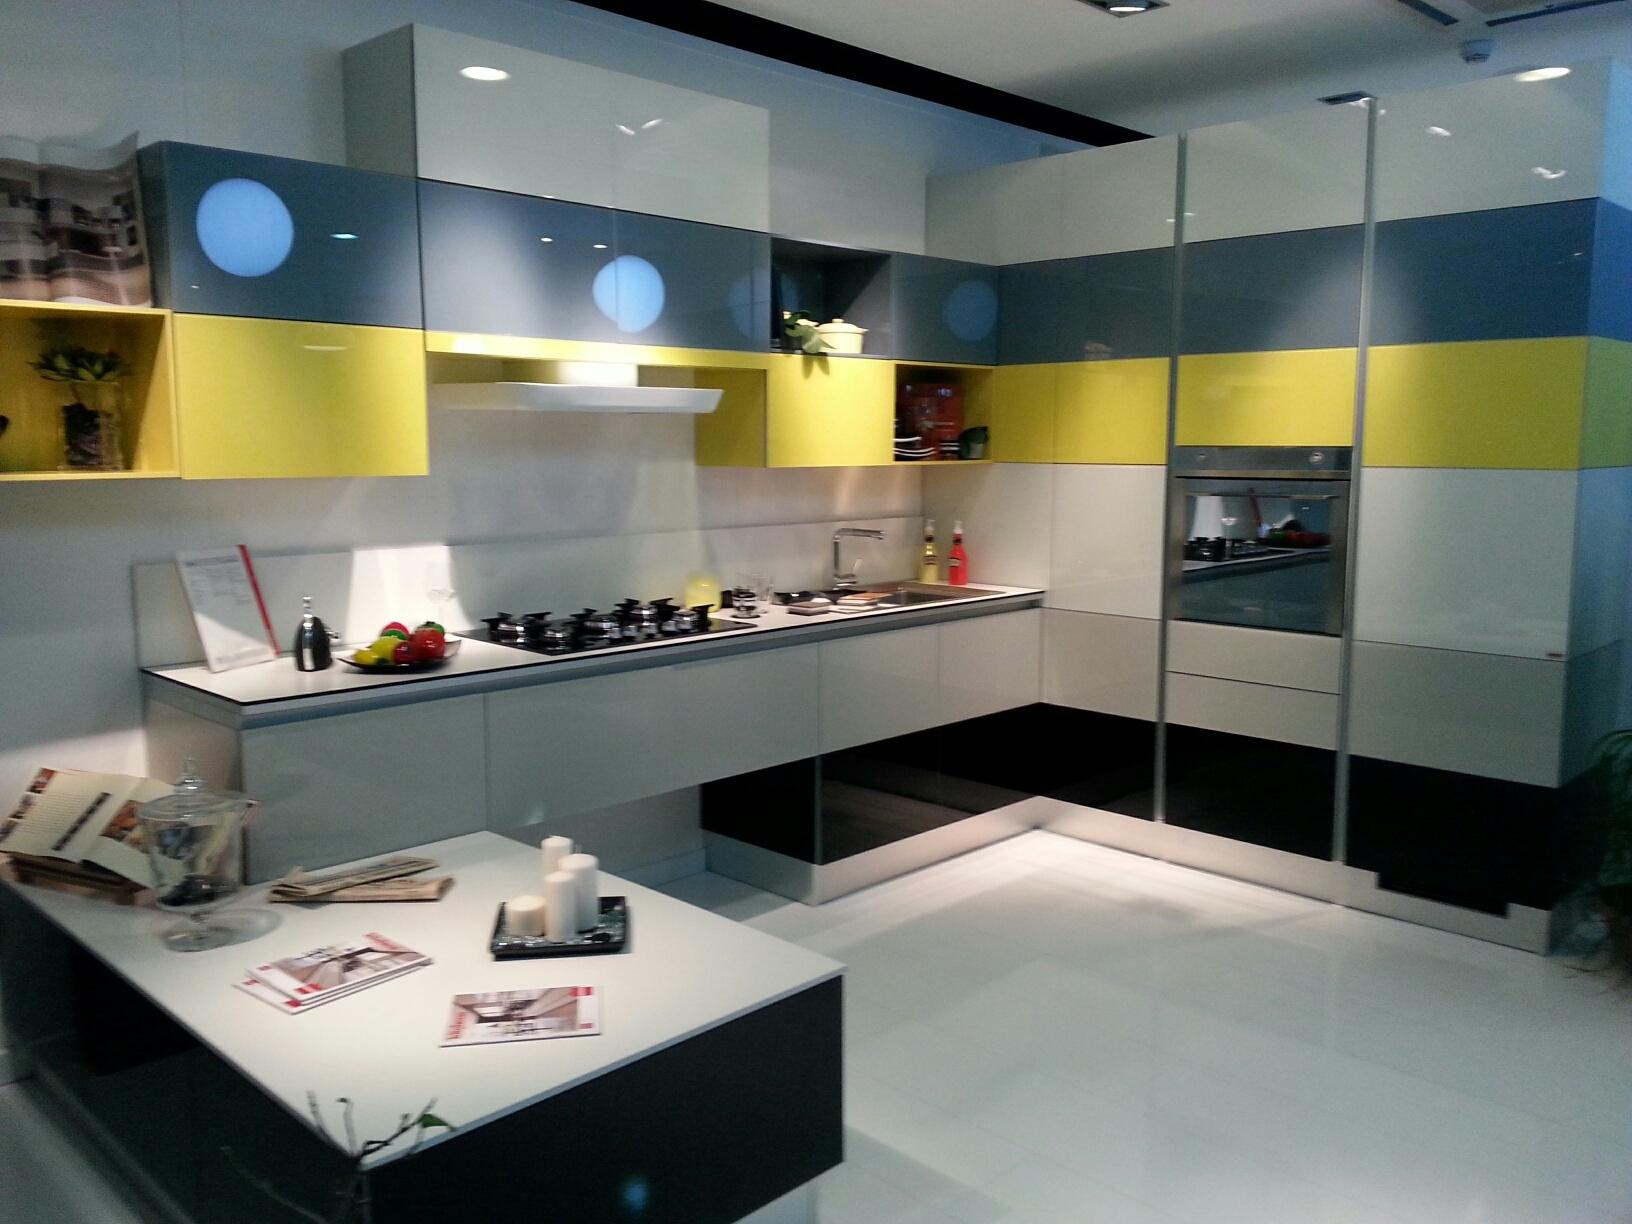 Best Listino Cucine Scavolini Gallery - Ideas & Design 2017 ...